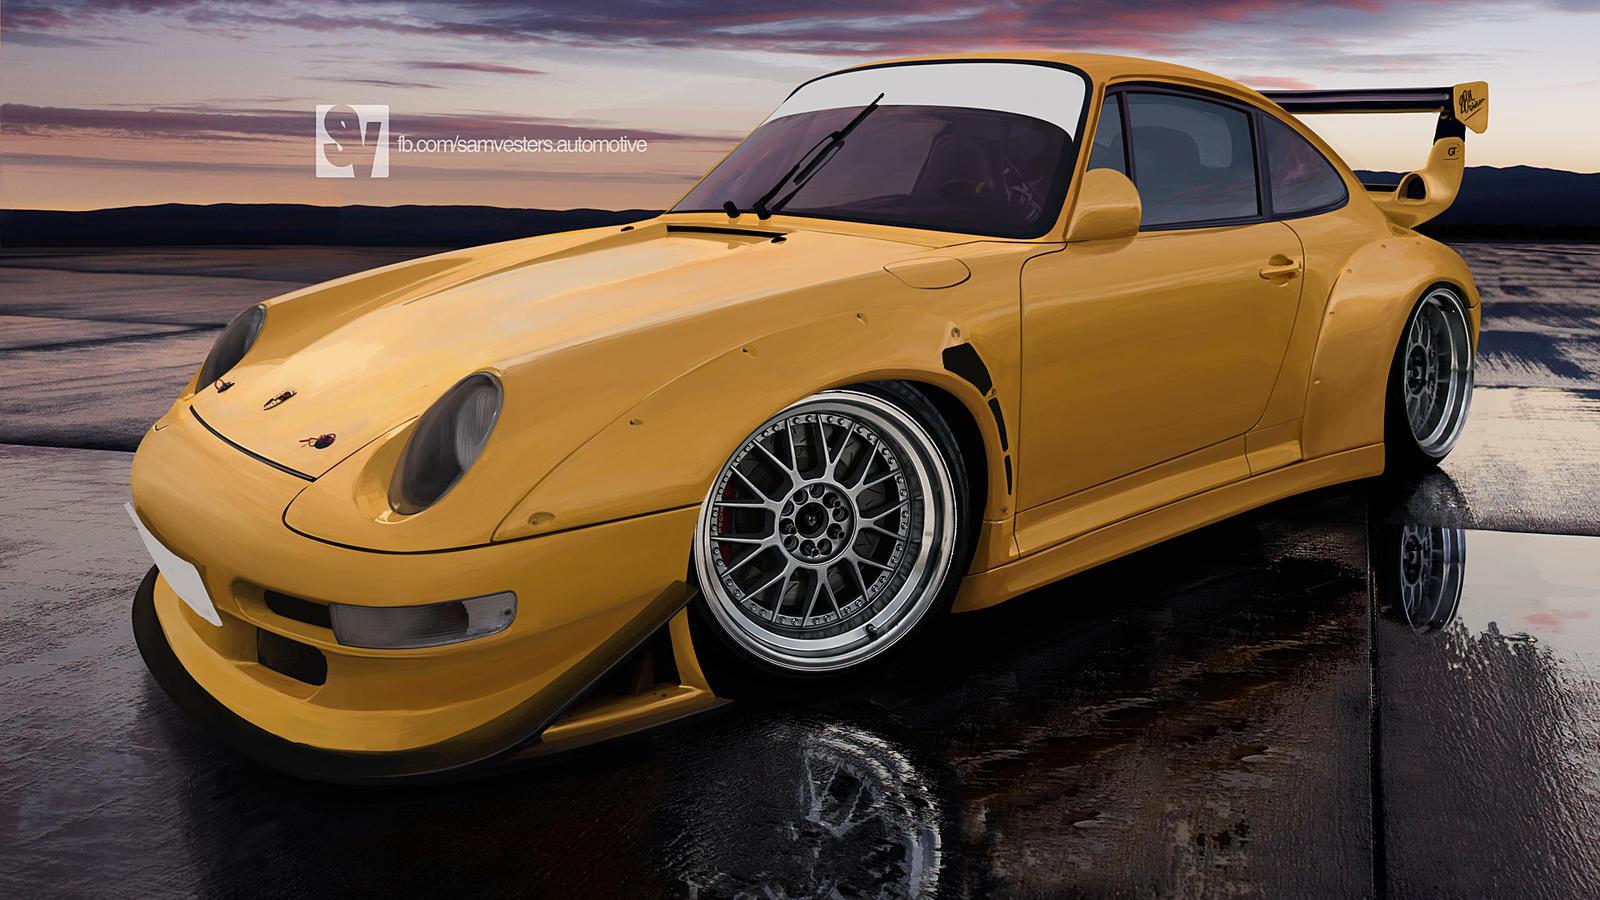 Porsche 993 GT by samvesters